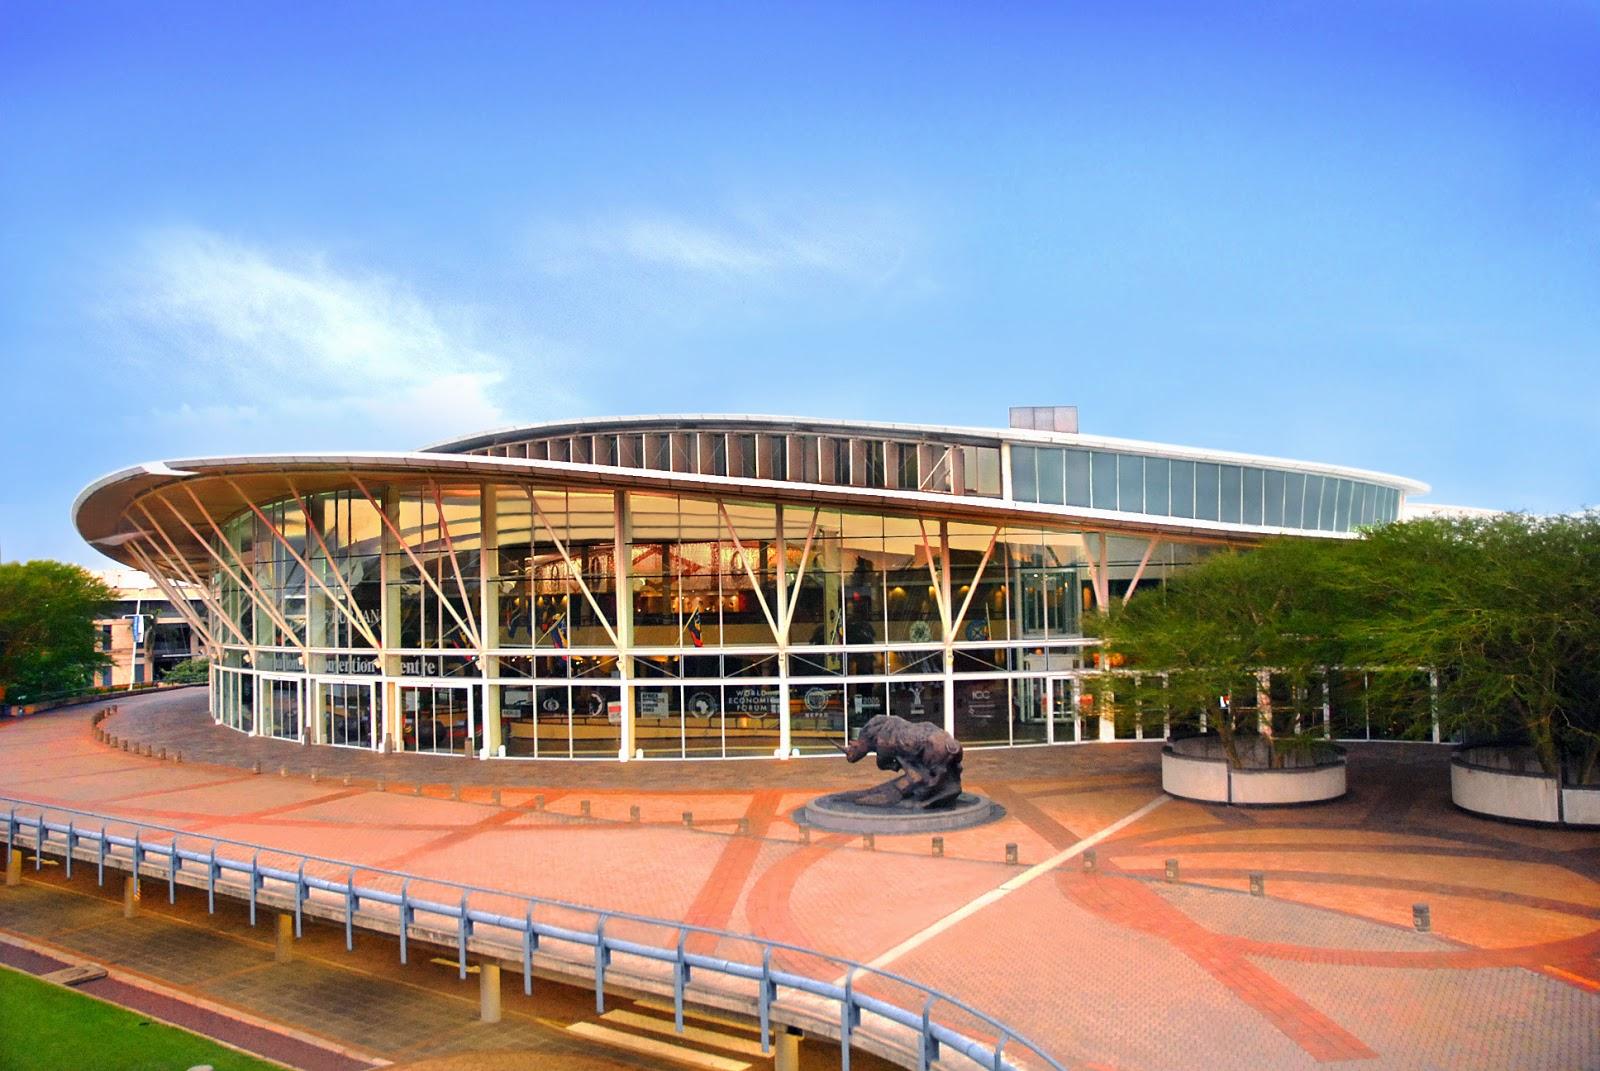 wycc2014 venue